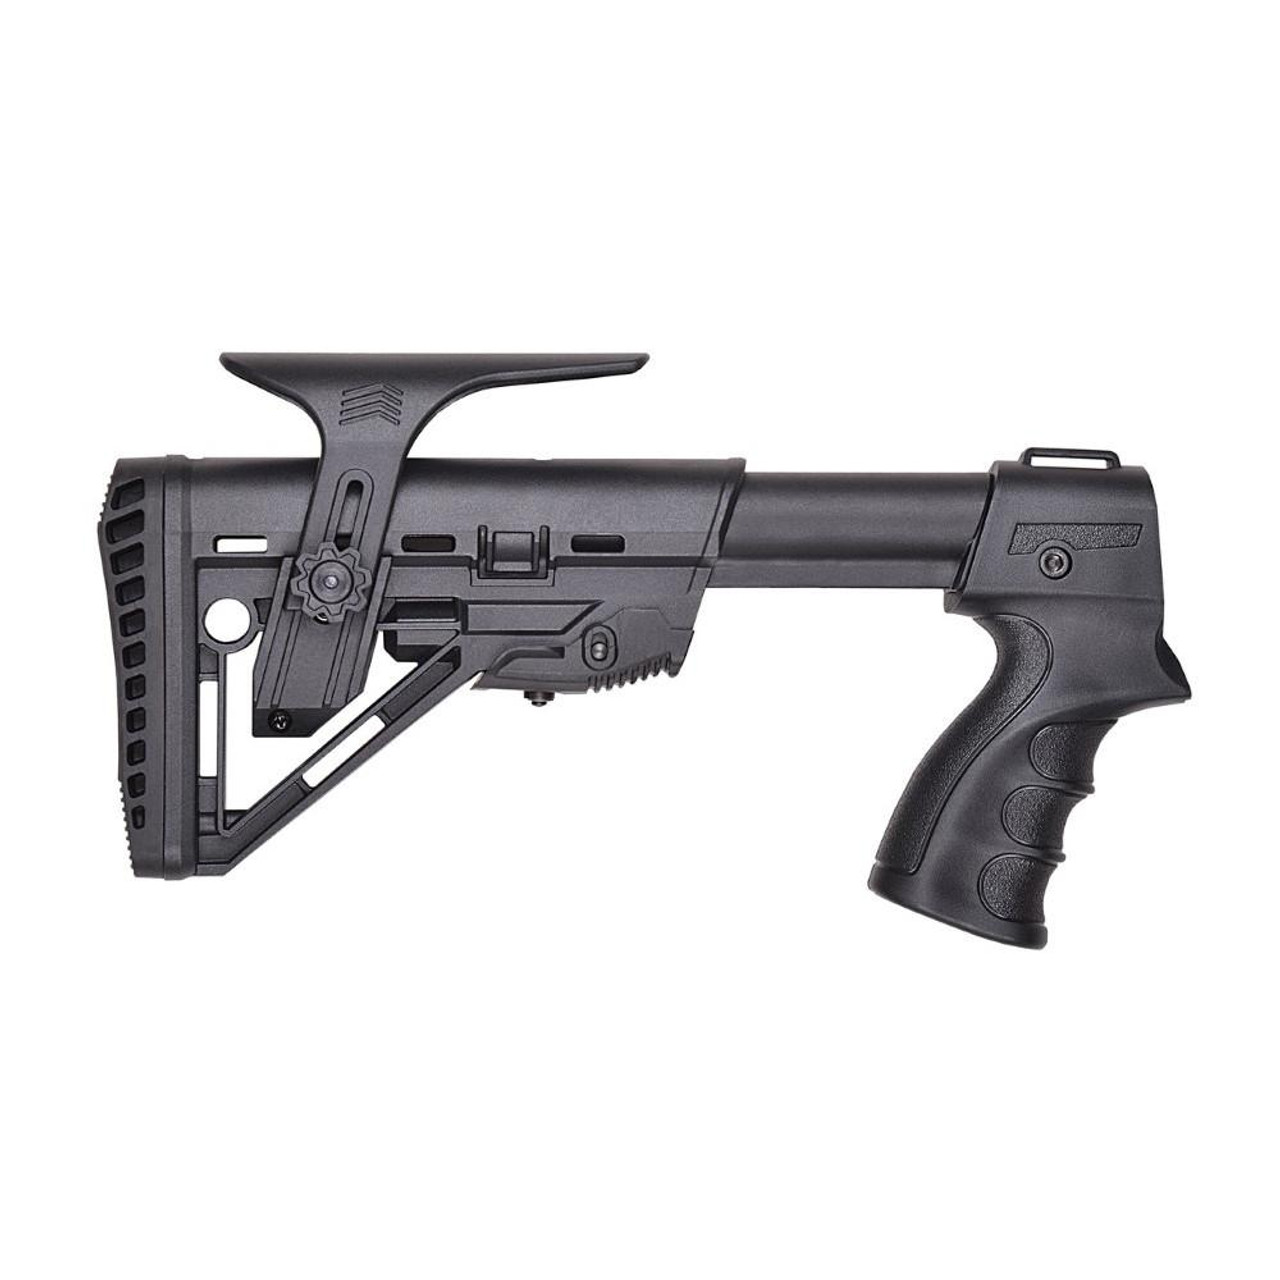 Canuck Tactical Sliding Stock w/Pistol Grip